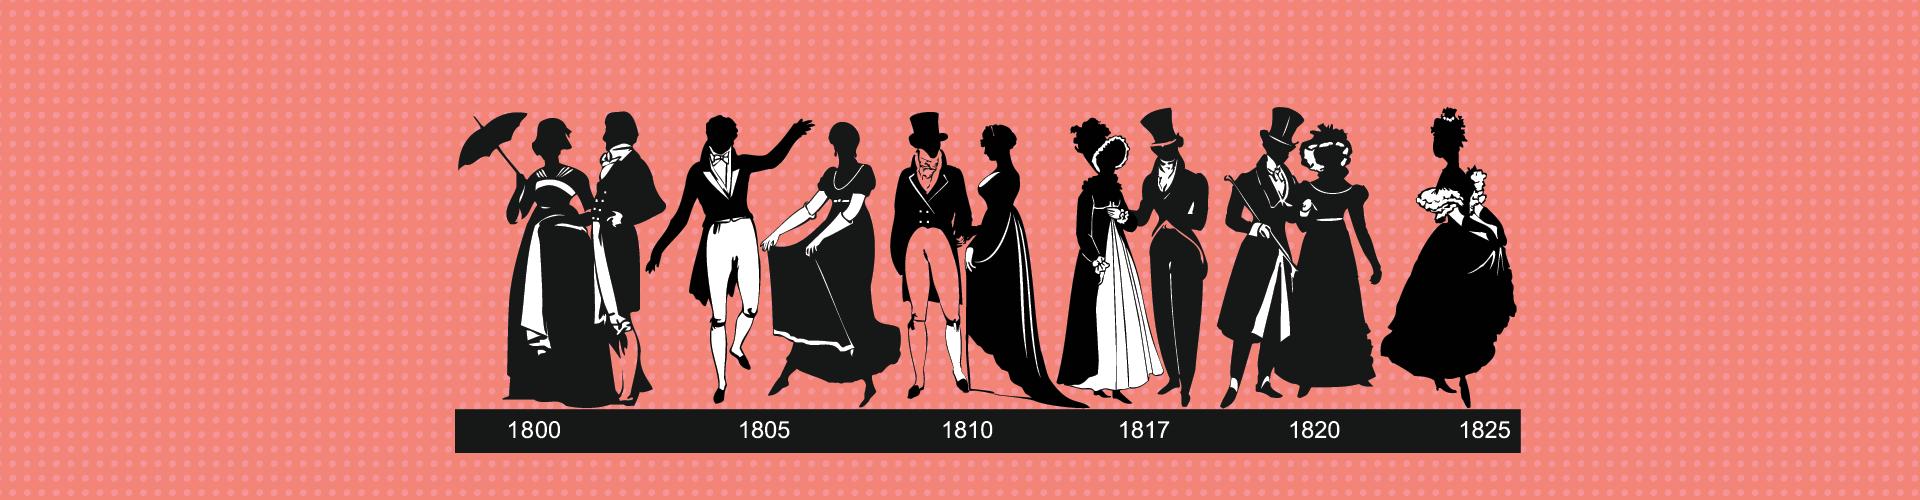 1800 to 1829